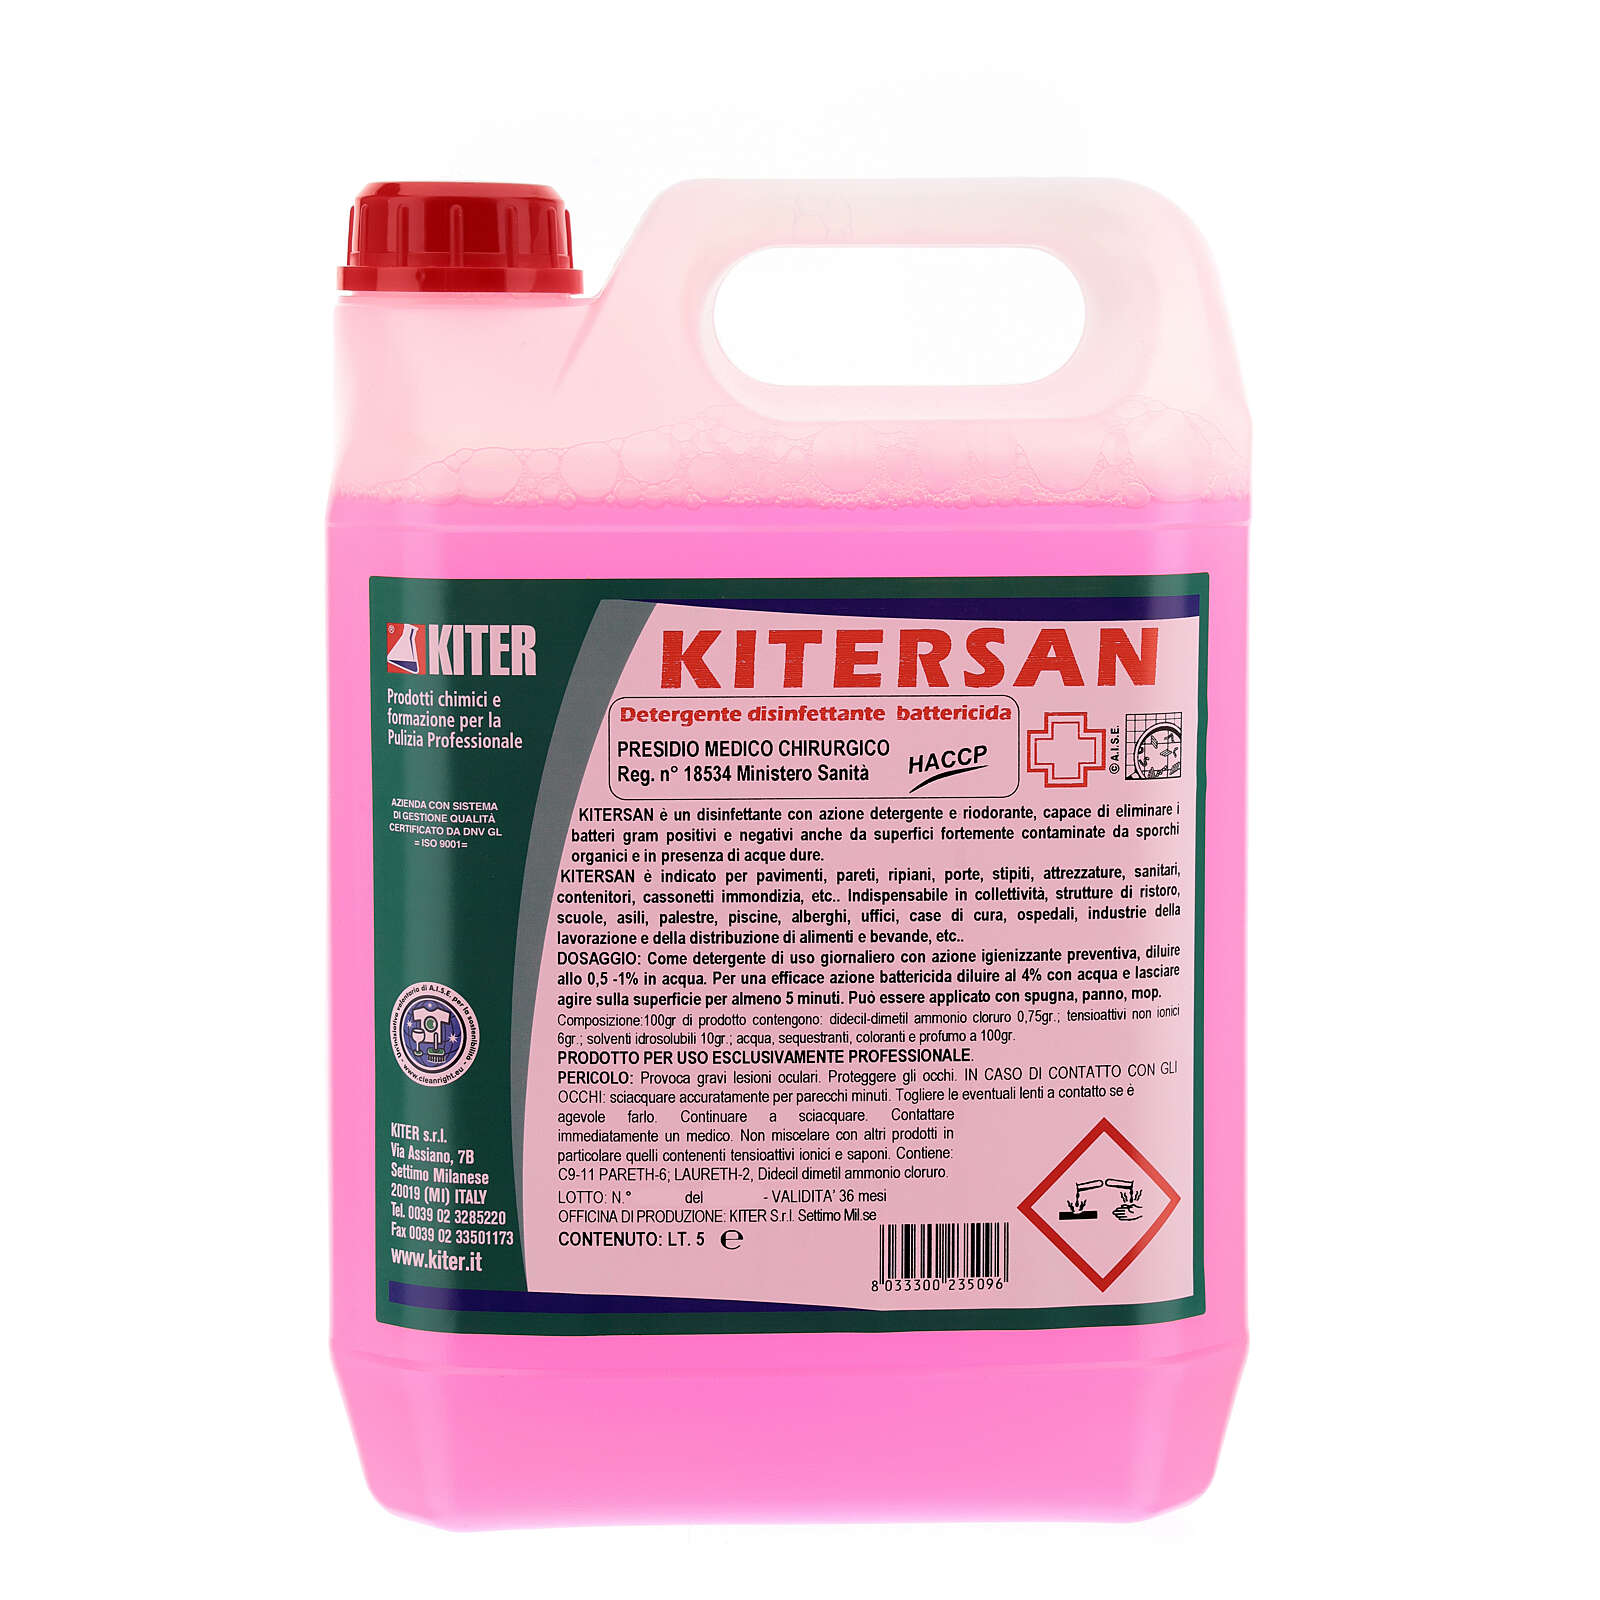 Reinigungsmittel, Desinfektionsmittel, Bakterizid Kitersan, 5 Liter 3